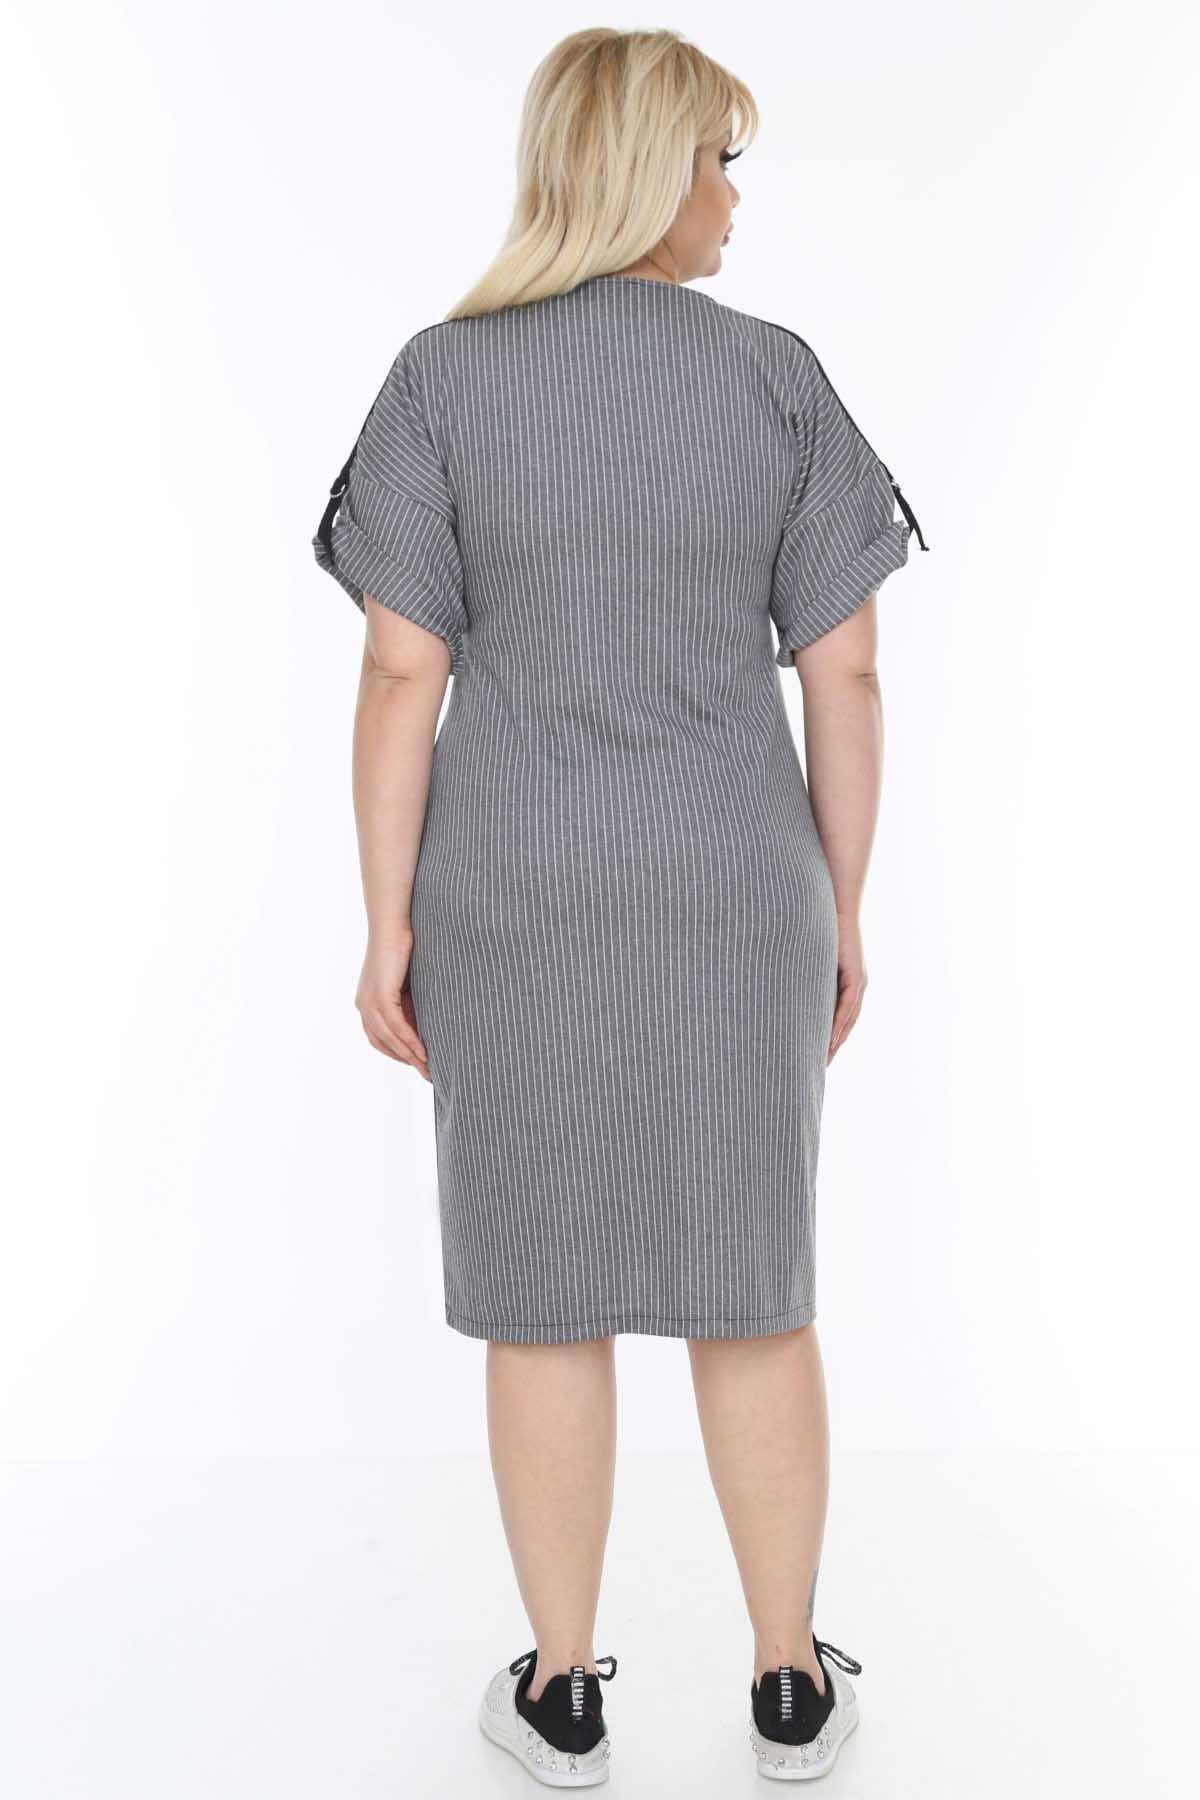 Şeritli Gri Elbise 6D-0491